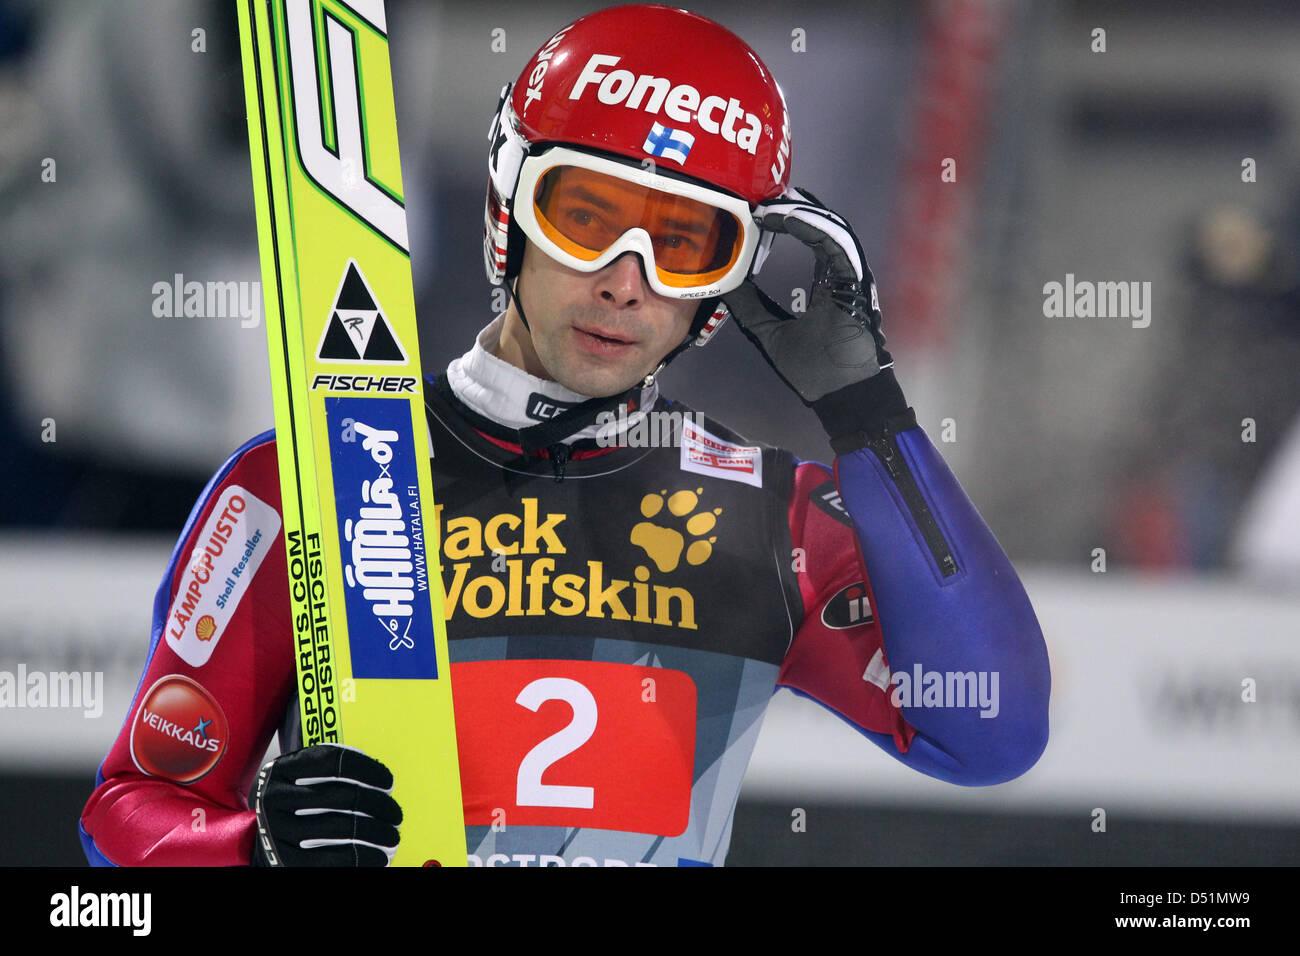 Finnische Skispringer